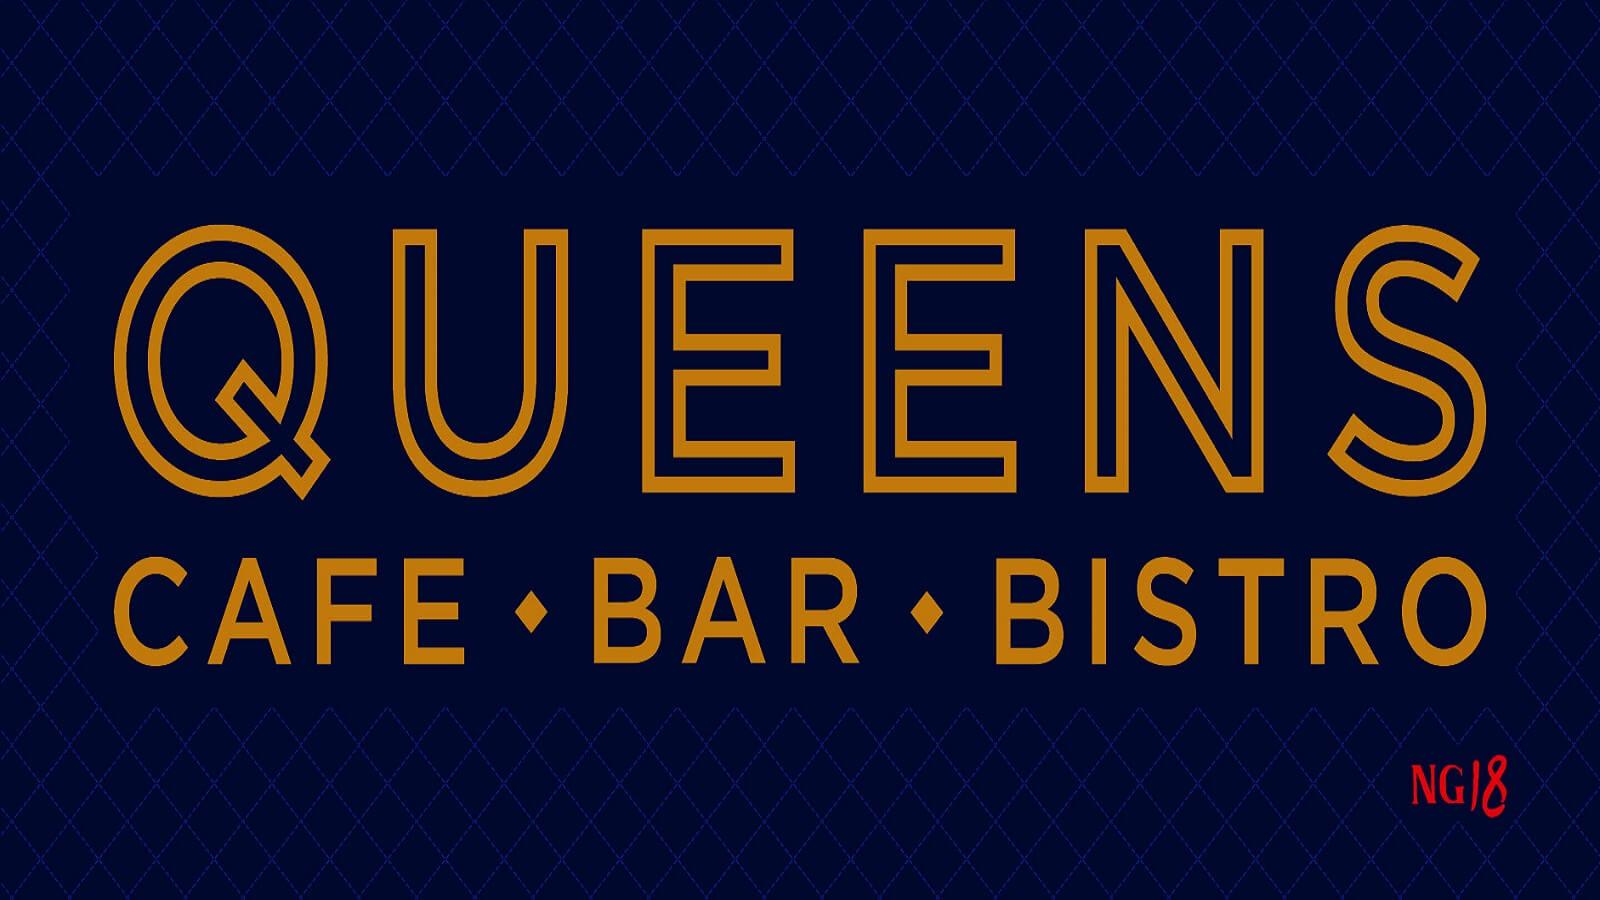 Queens Café Bar Bistro